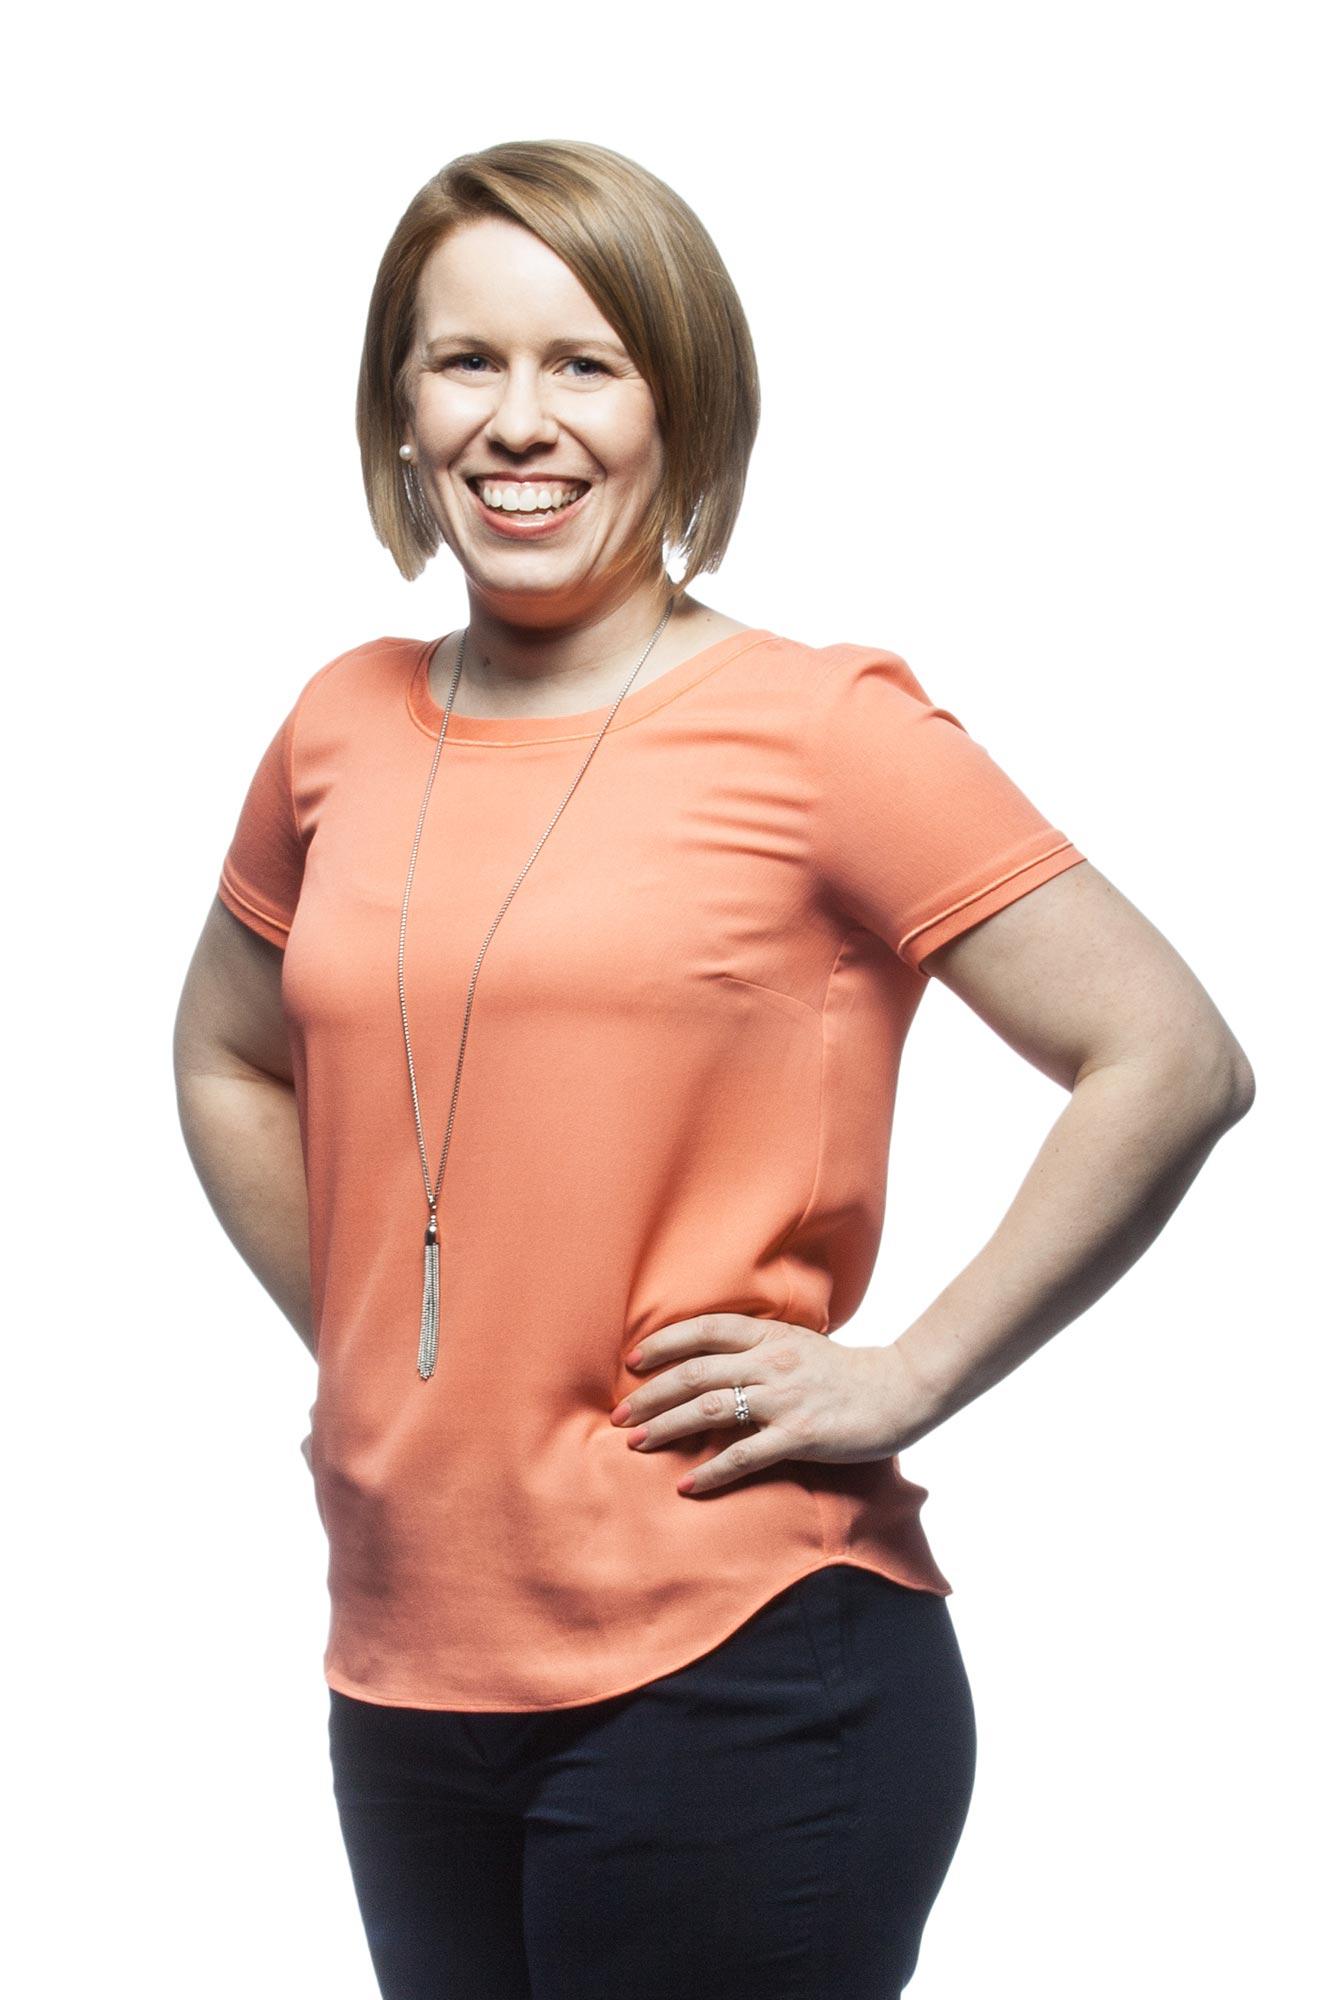 Lara Stroup